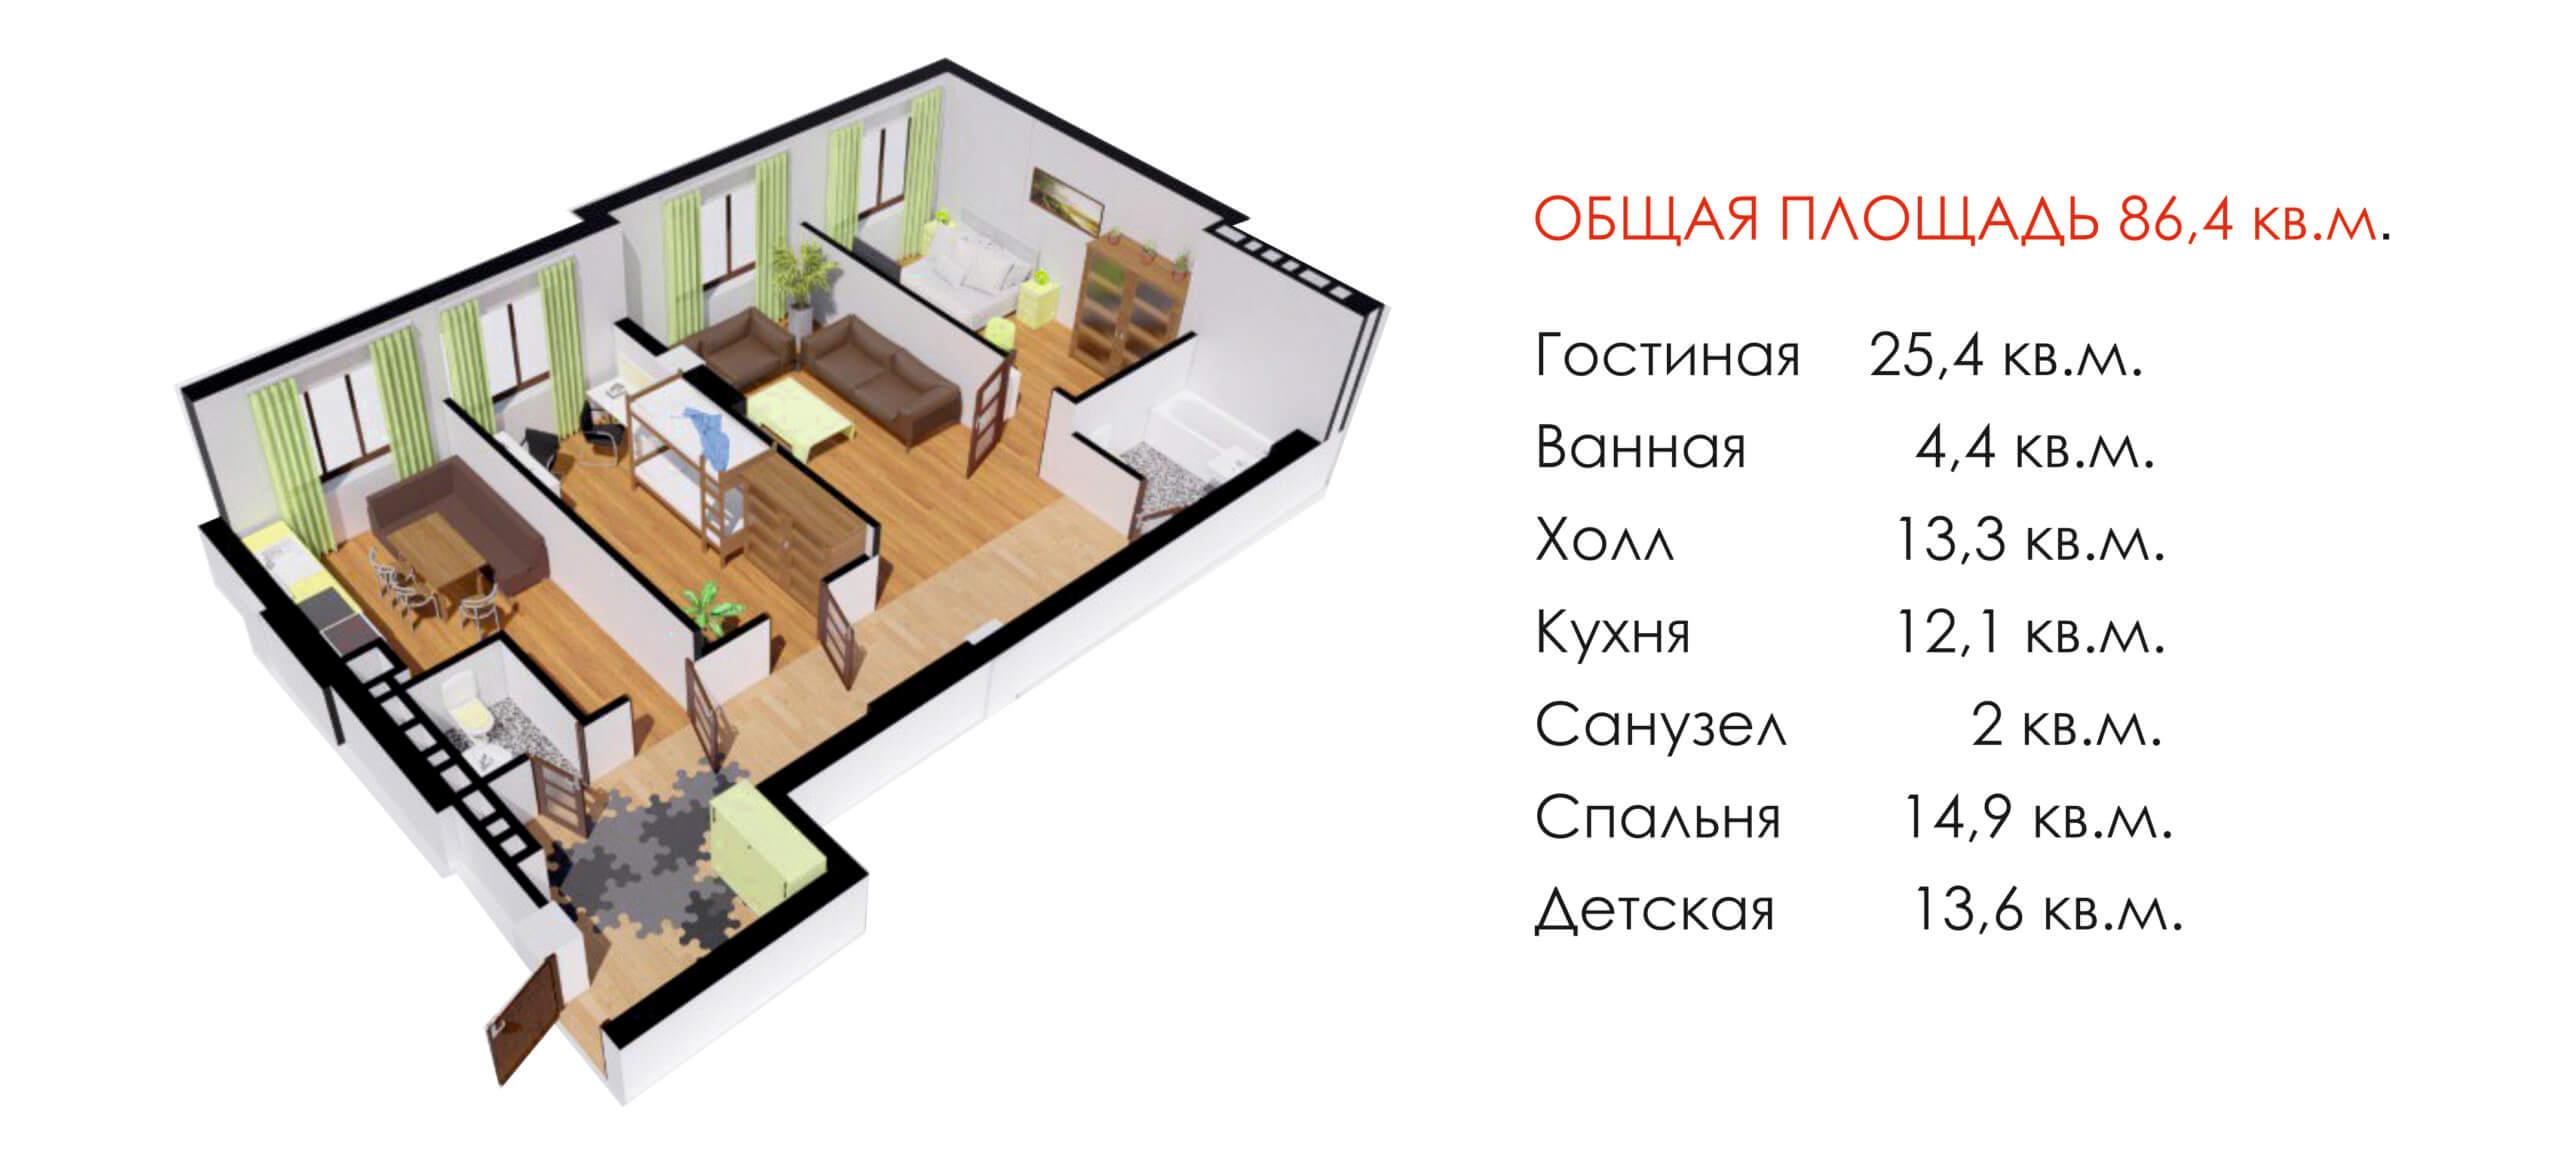 3-х комнатная квартира 86,4 кв.м.